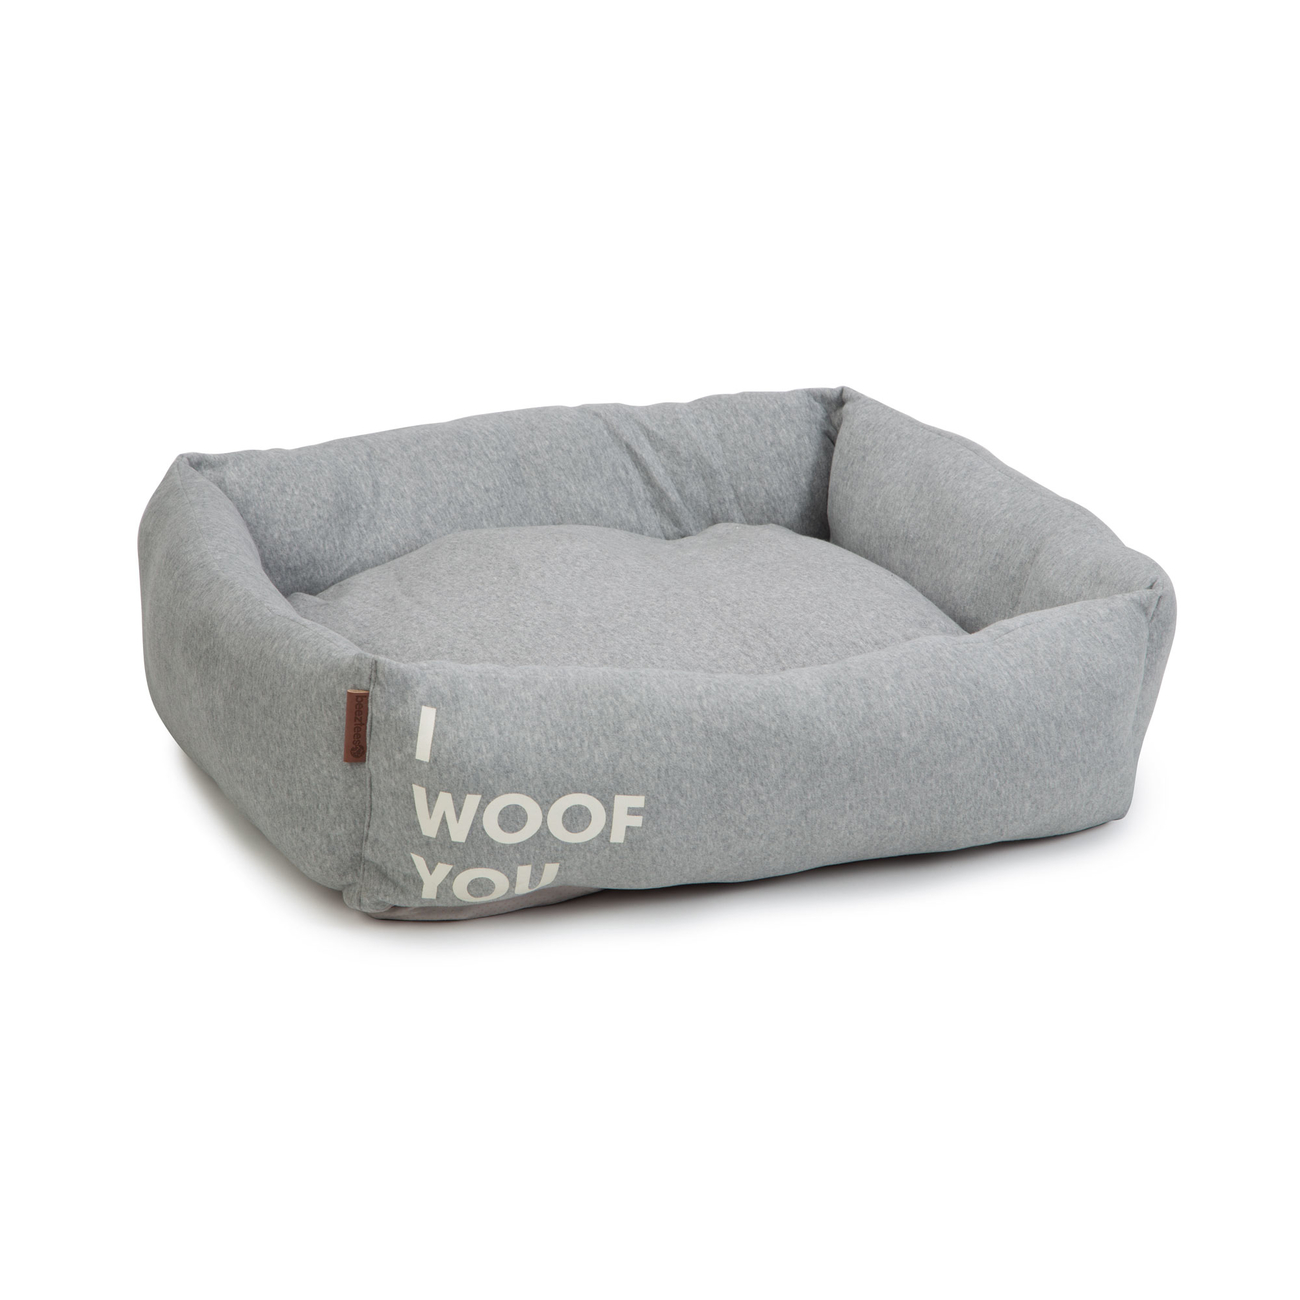 Beeztees Hundebett Woof You von Beeztees günstig bestellen